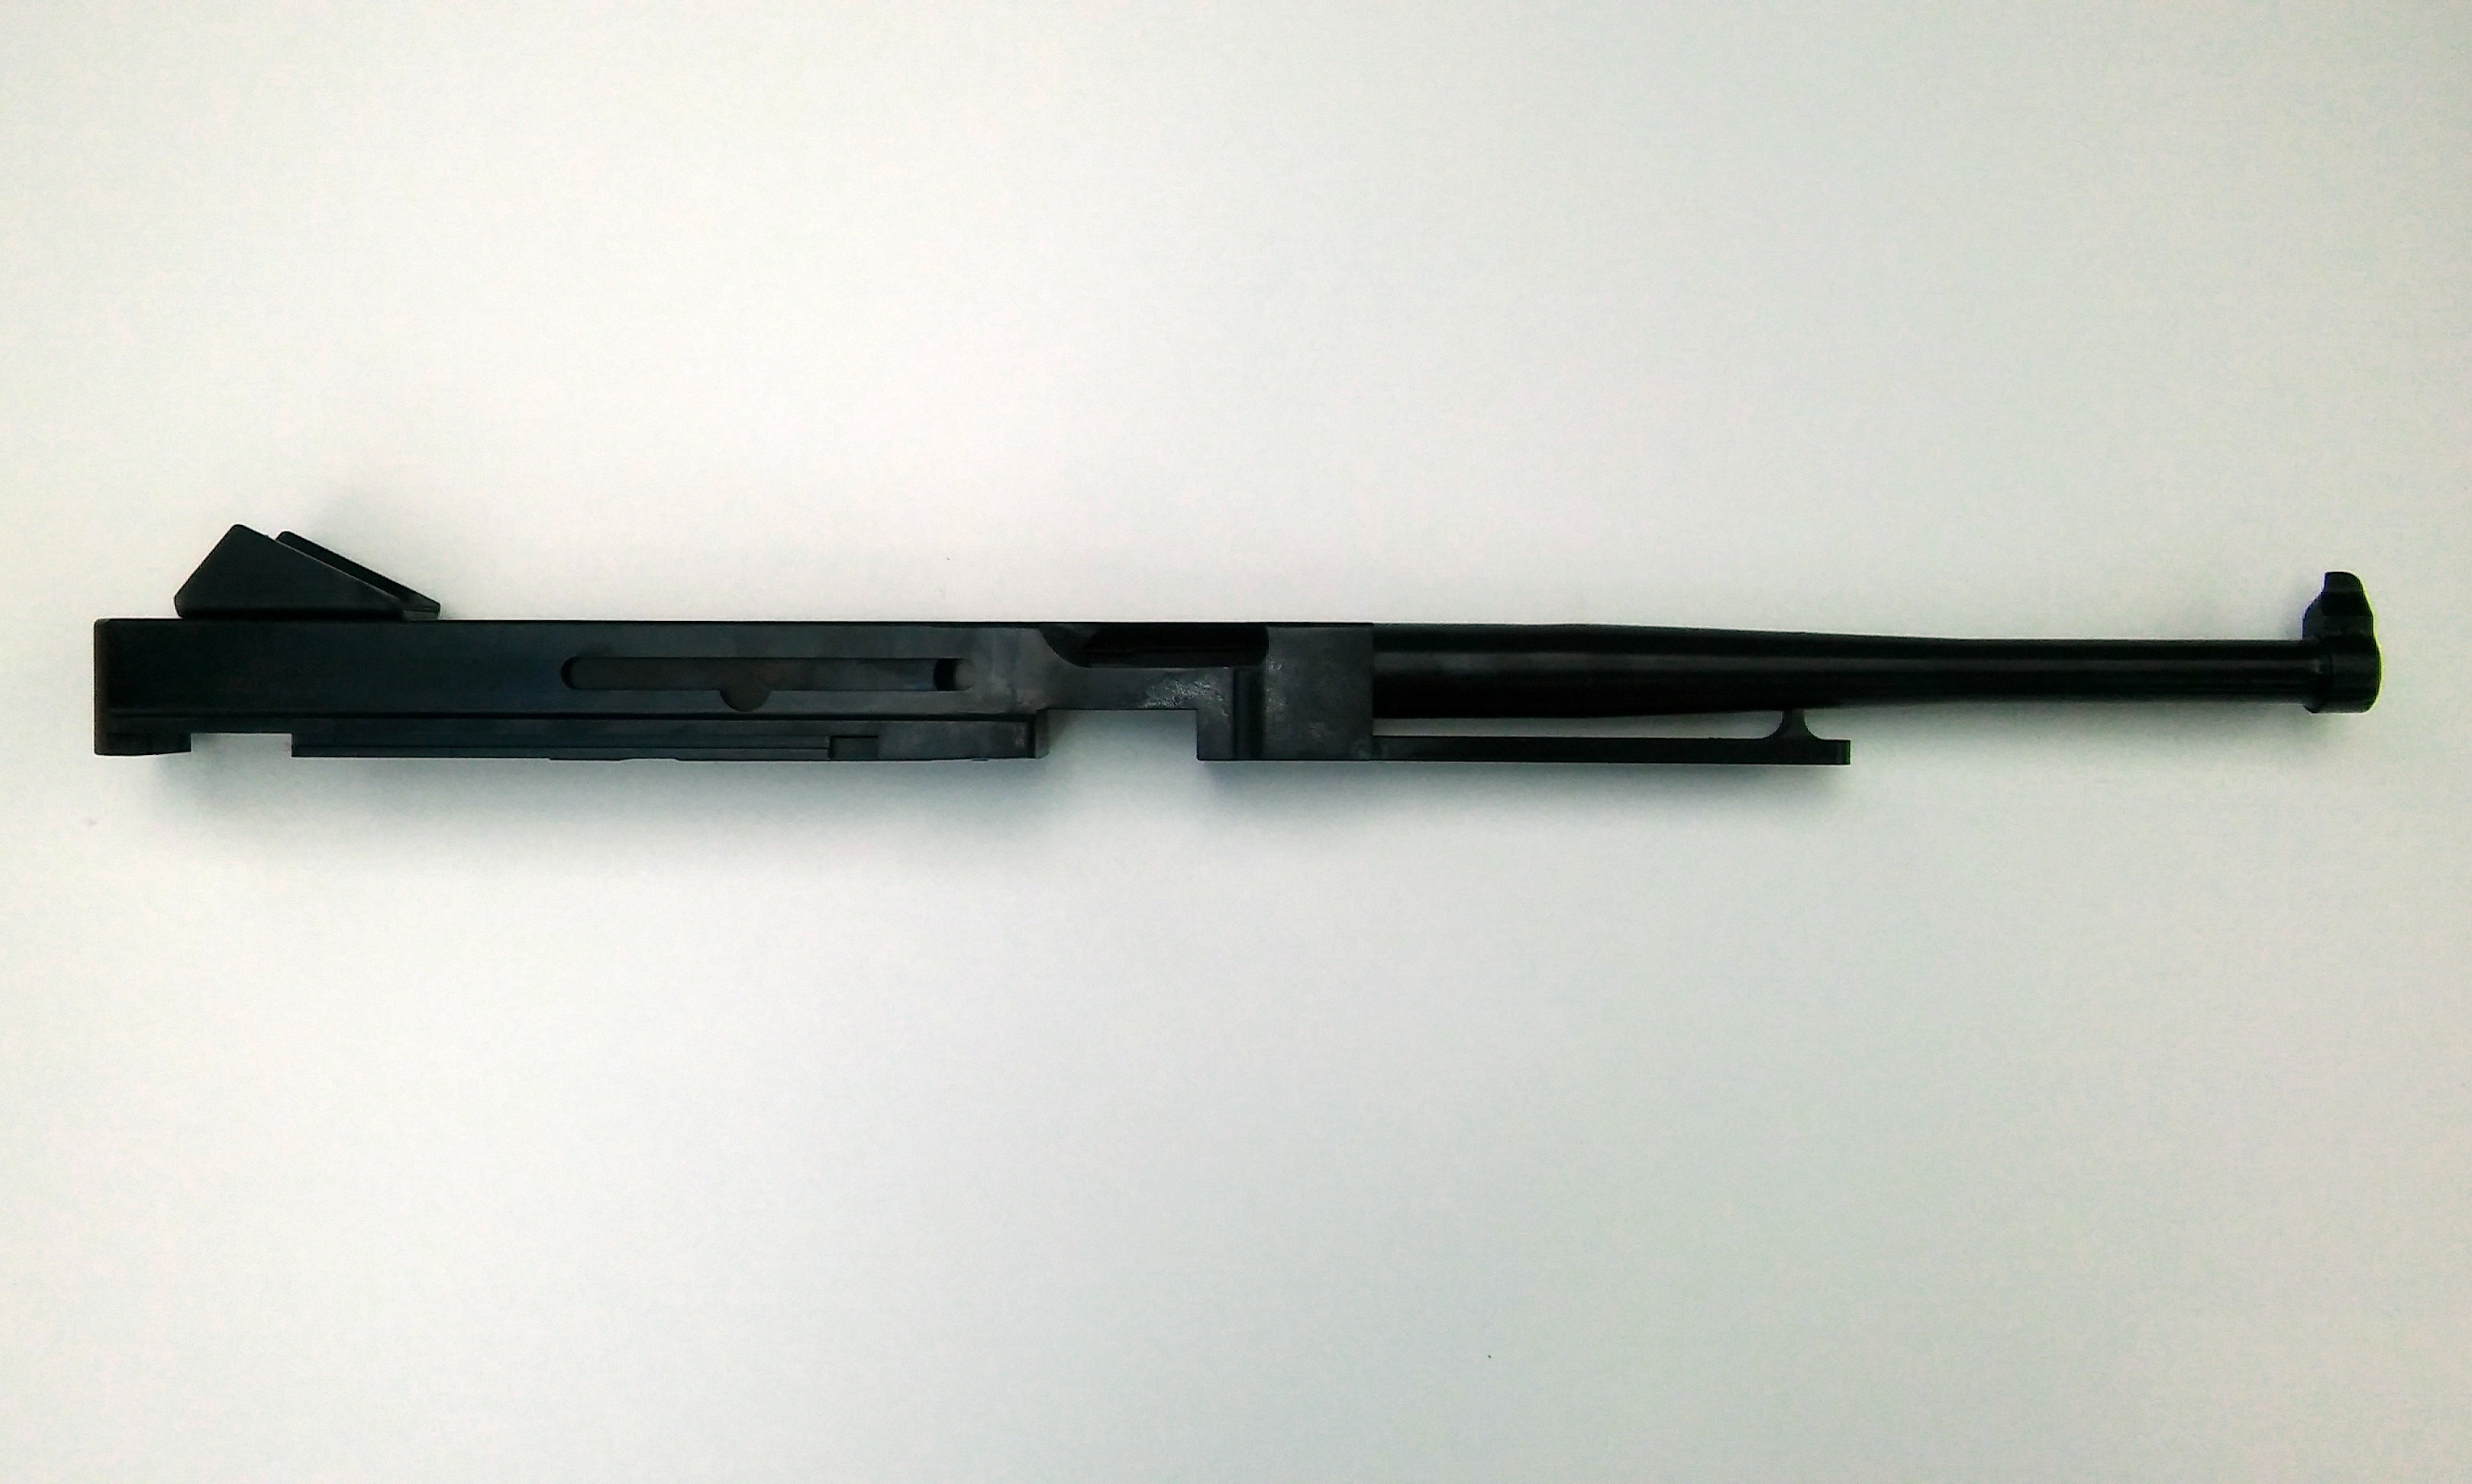 Indianapolis Ordnance - Blank Firing Replicas